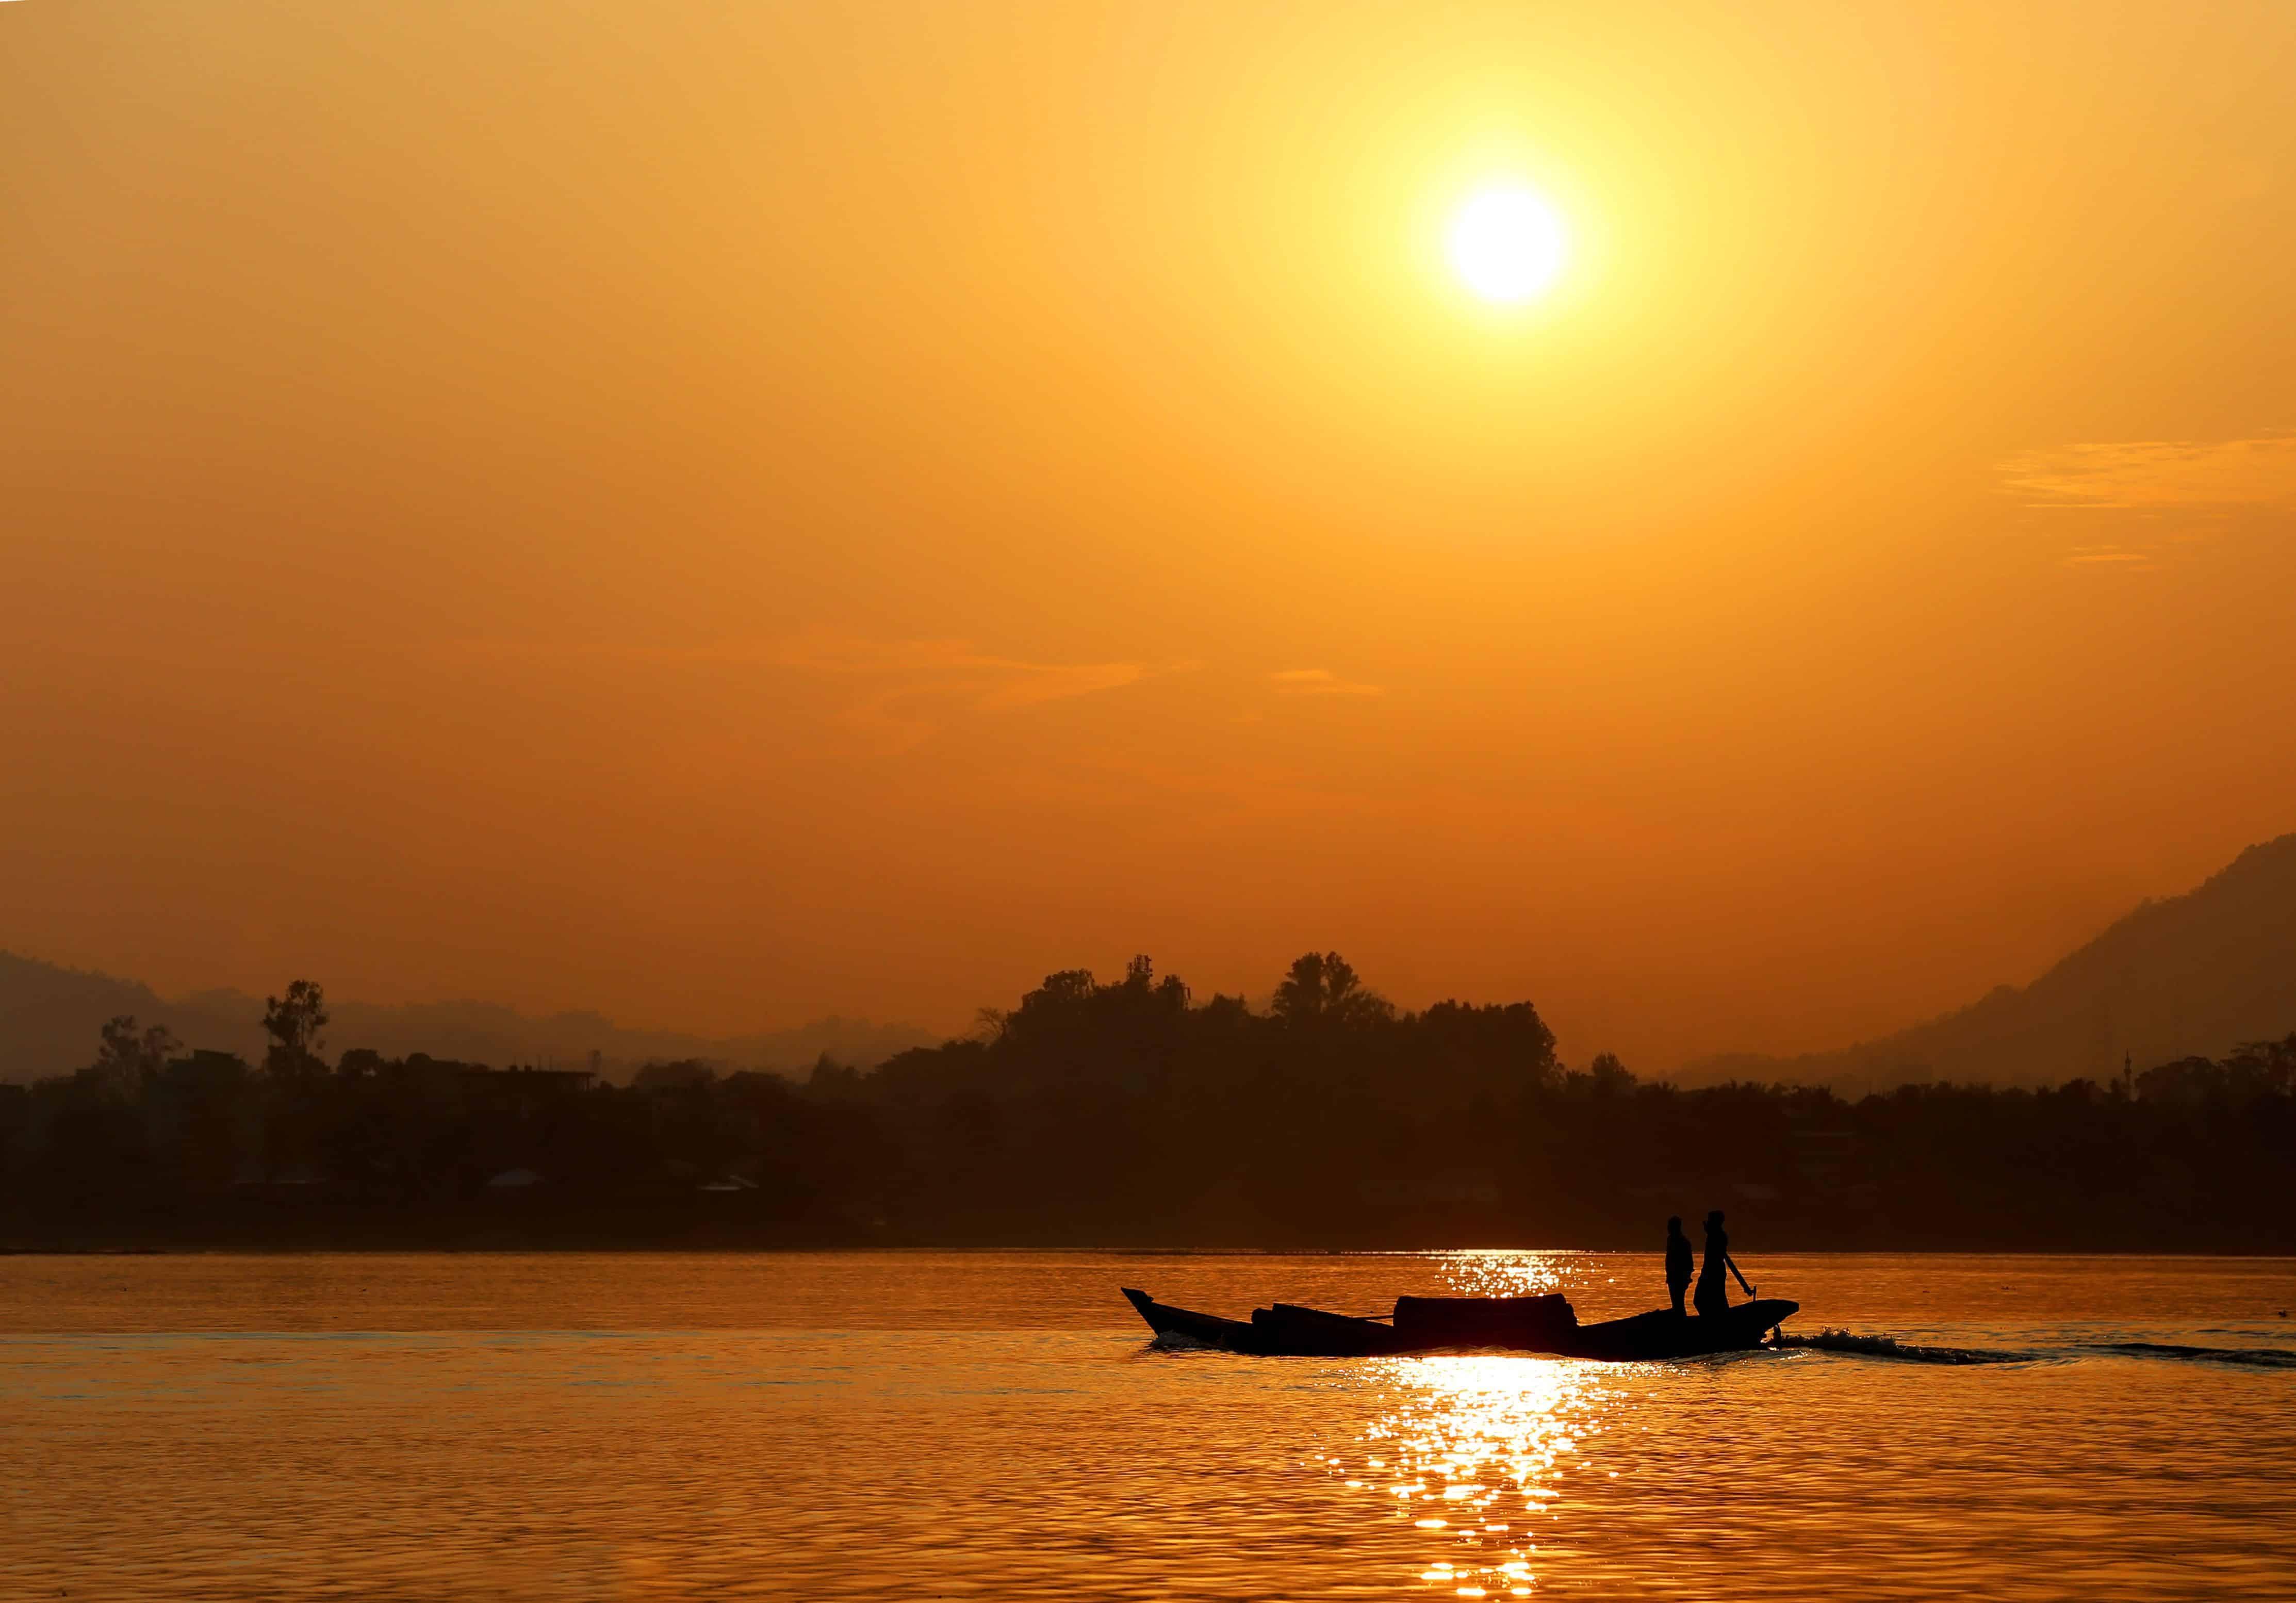 Setting sun at Kaptai lake of Bangladesh